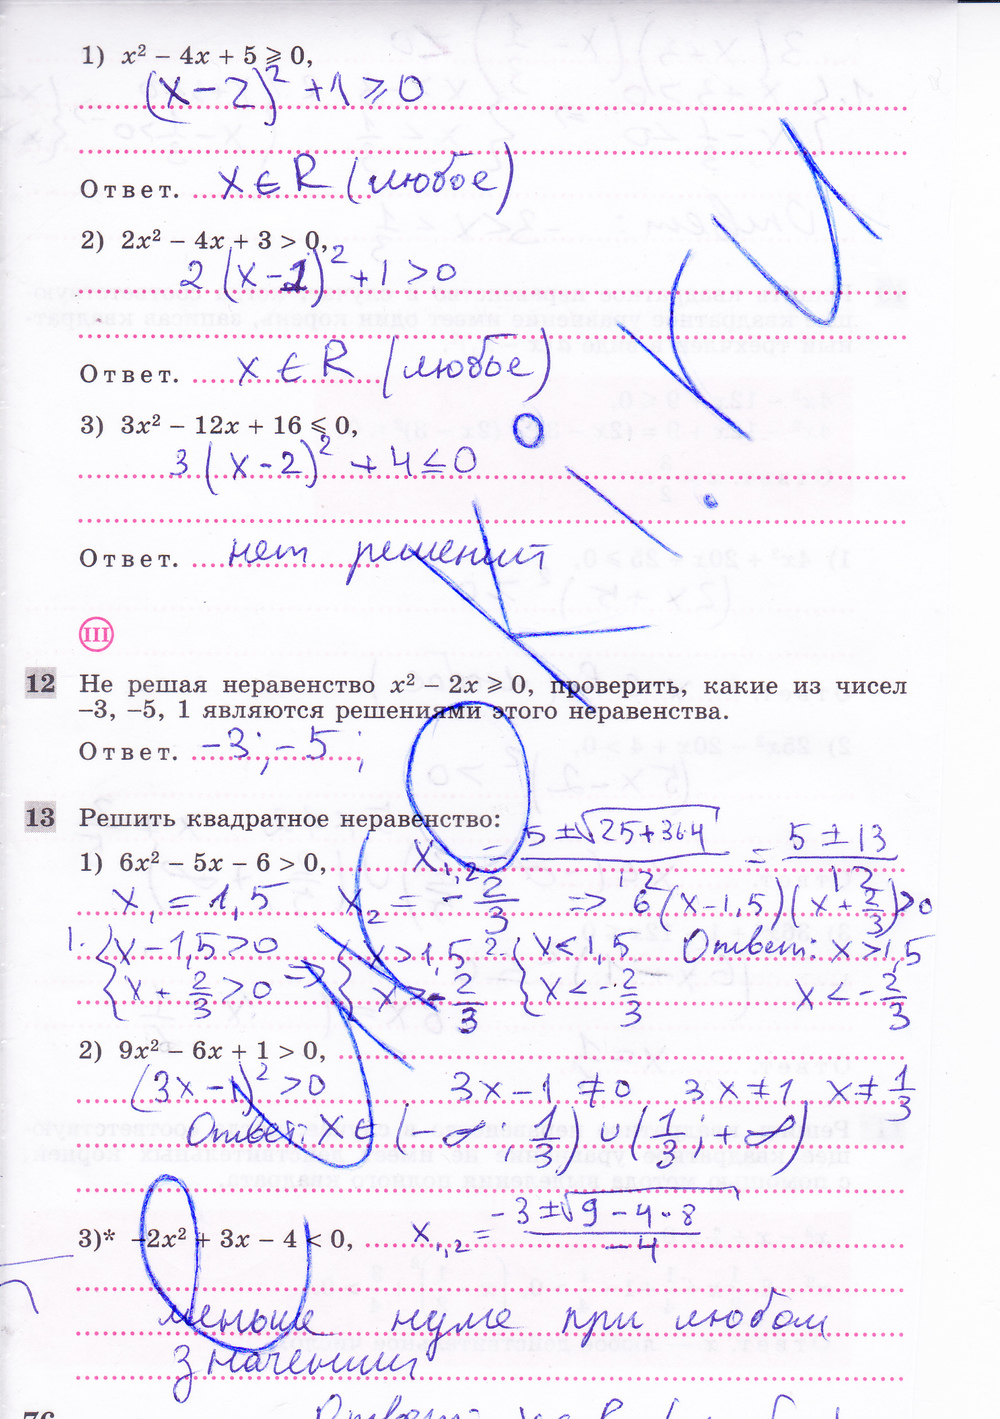 Алгебра федорова ткачева гдз шабунин по колягин класс 8